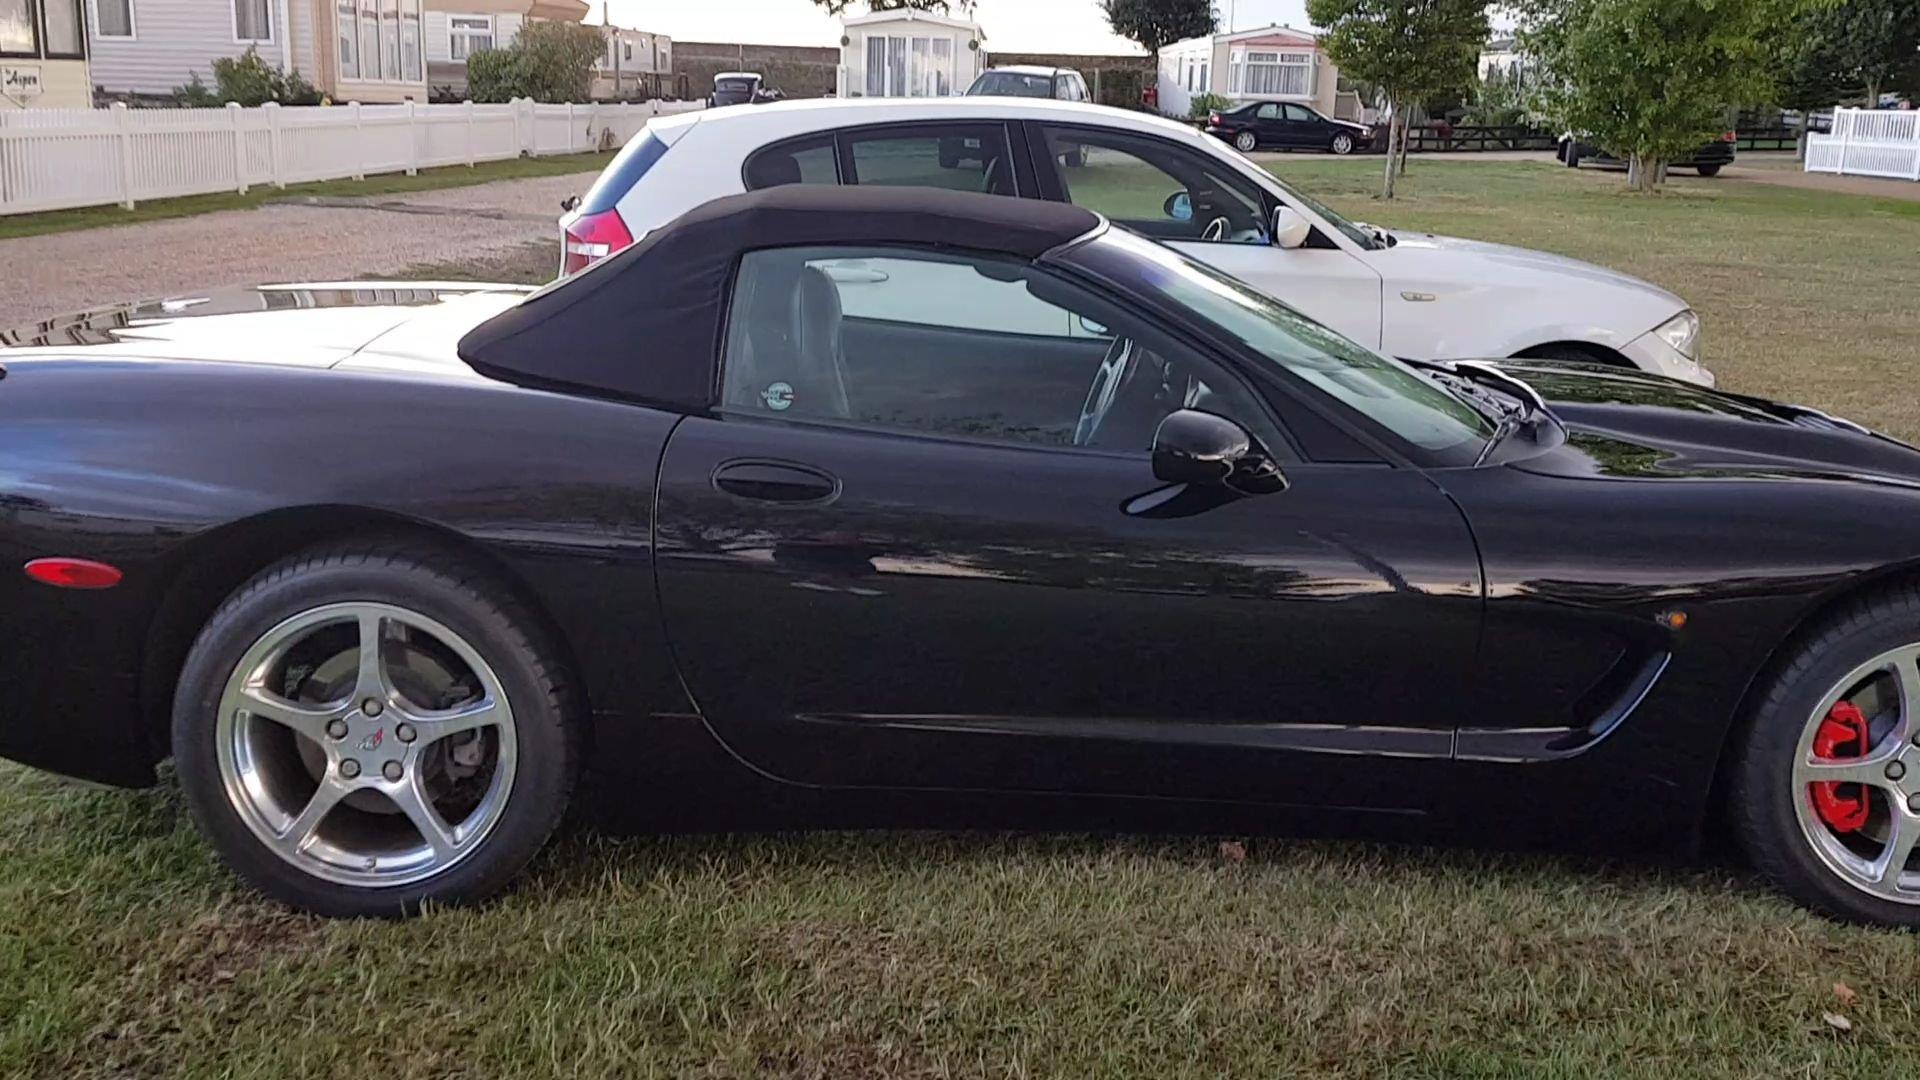 2000 chevrolet corvette c5 For Sale (picture 6 of 6)